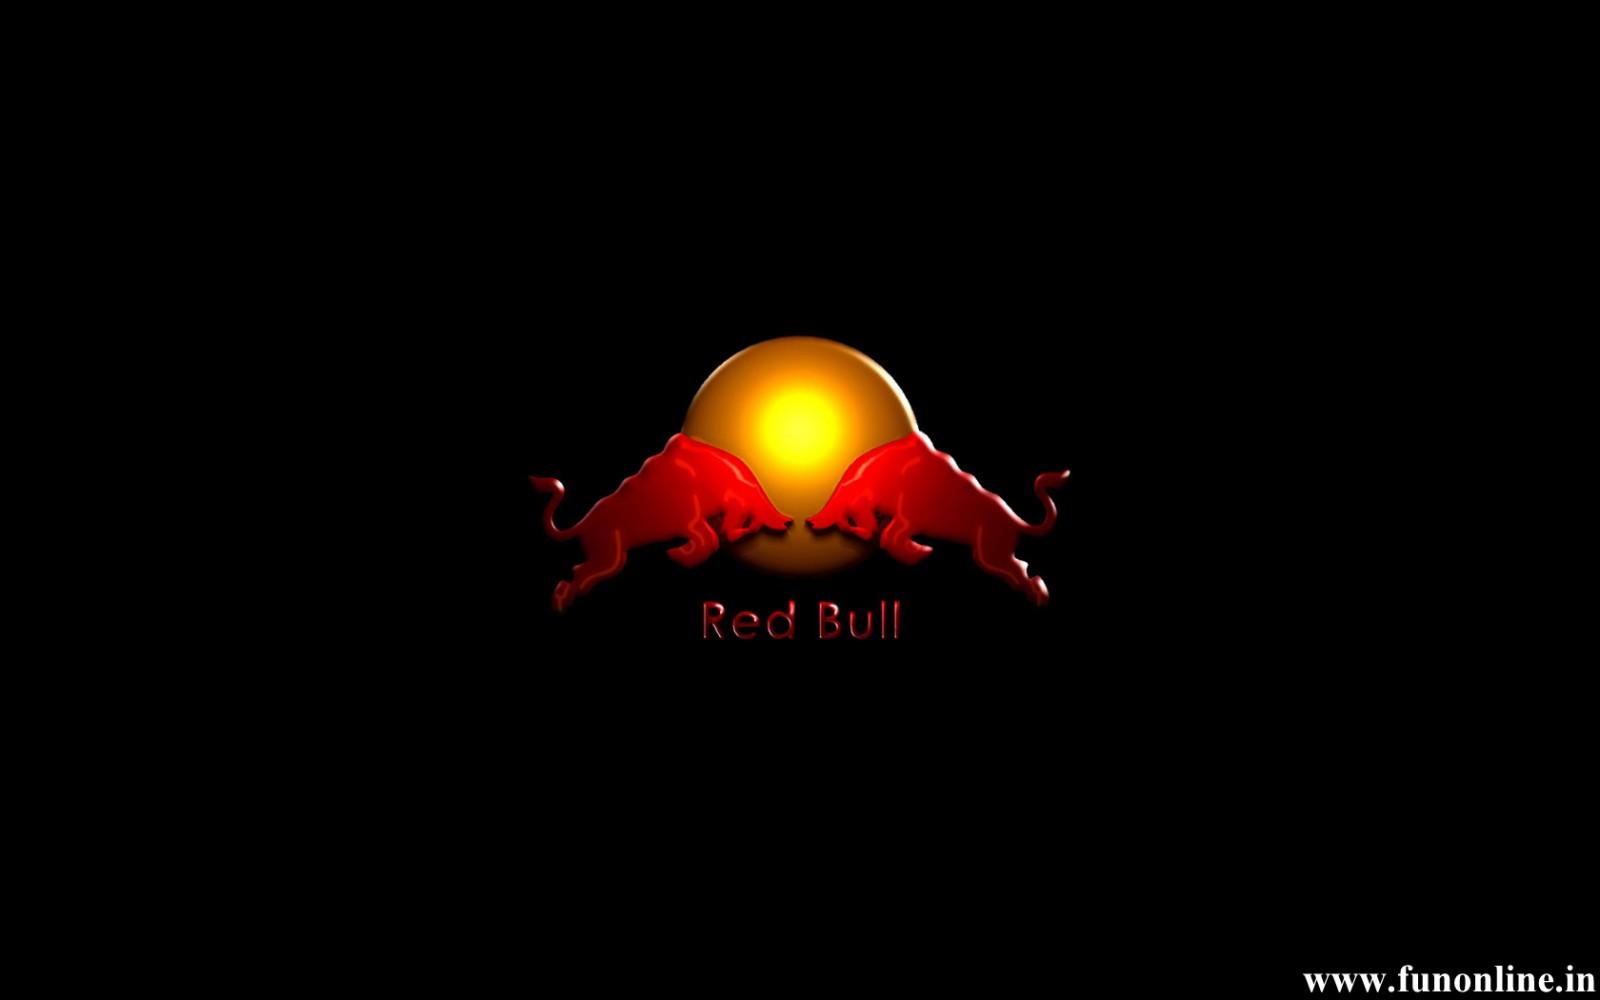 Bull Wallpapers Angry Bull HD Wallpapers Download Bulls Wallpaper 1600x1000